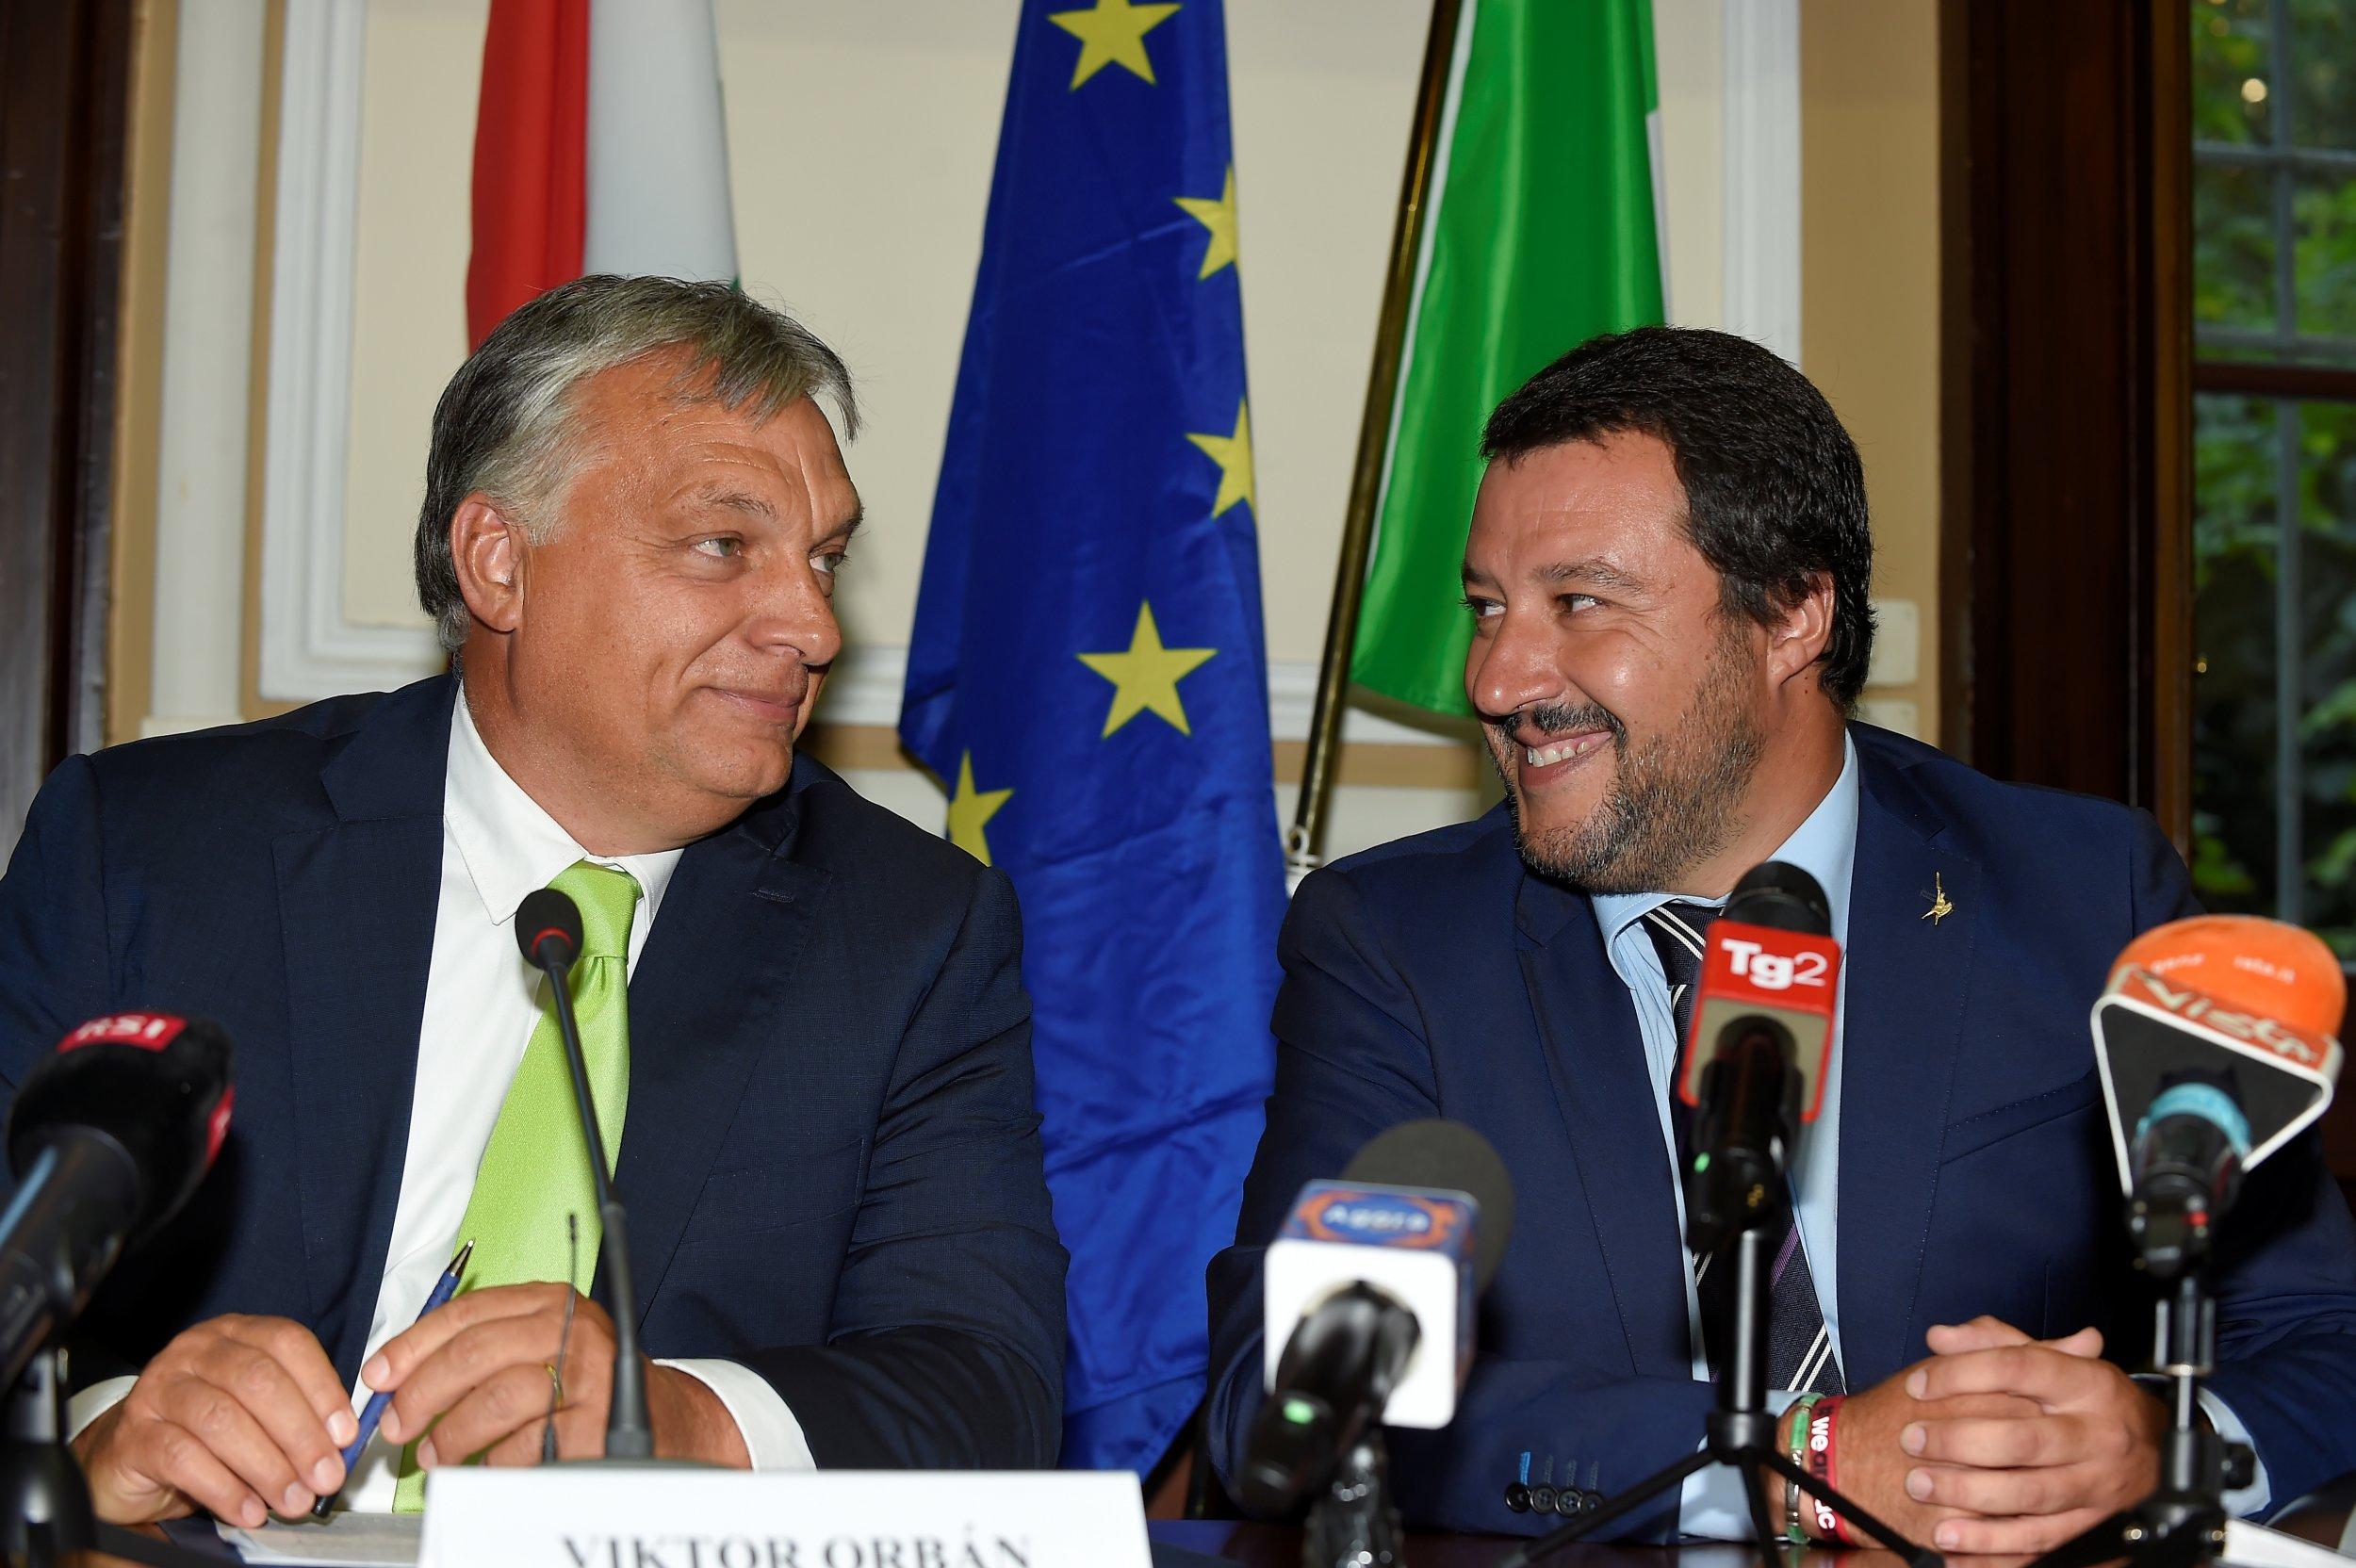 2018-08-28T194910Z_1_LYNXNPEE7R1HC_RTROPTP_4_ITALY-HUNGARY